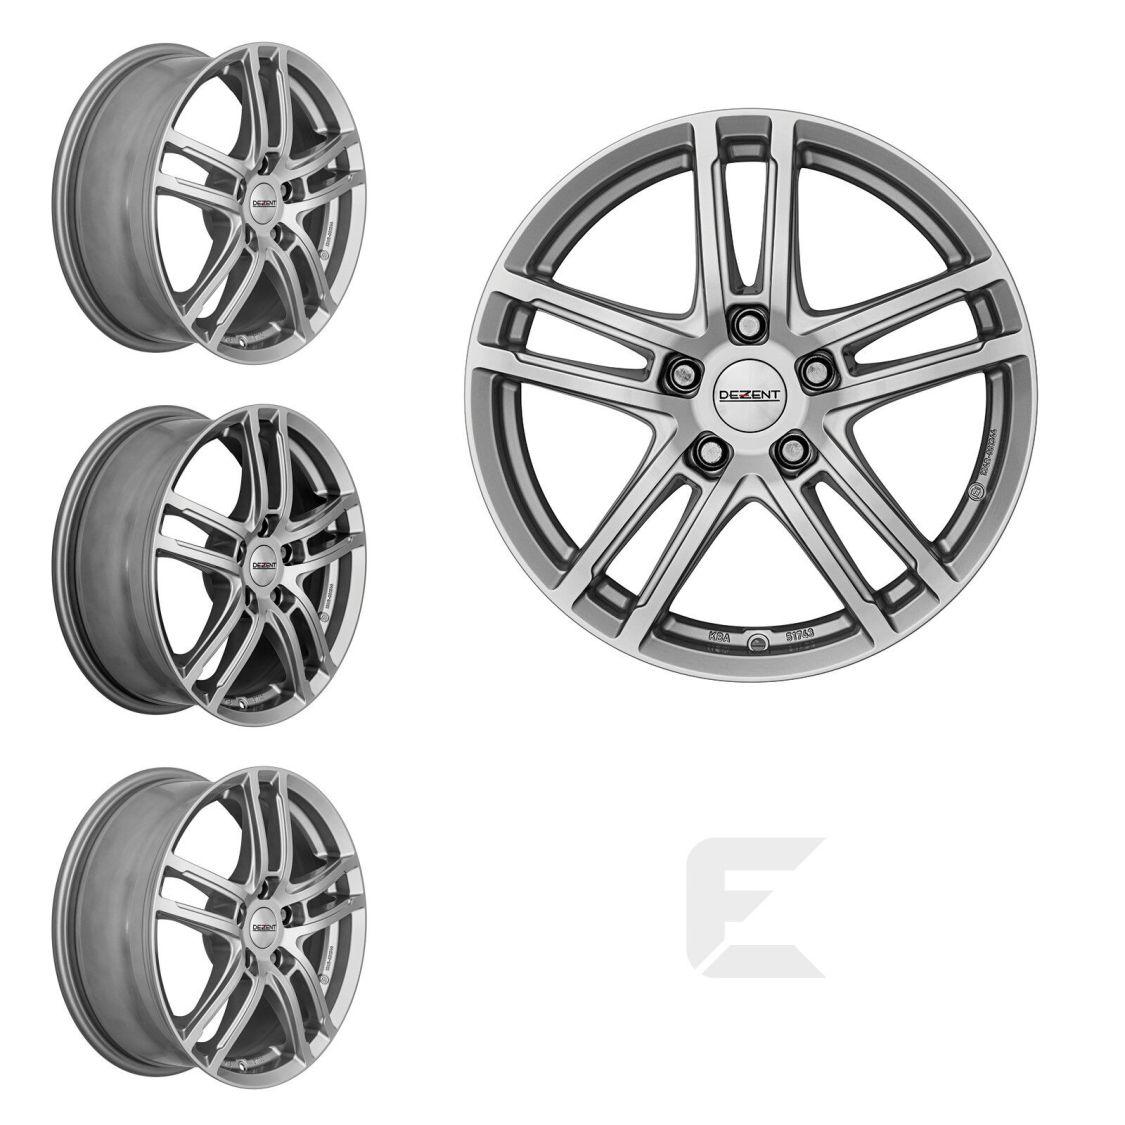 4x 16 Zoll Alufelgen für Mercedes Benz A-Klasse / Dezent TZ (B-83001173)